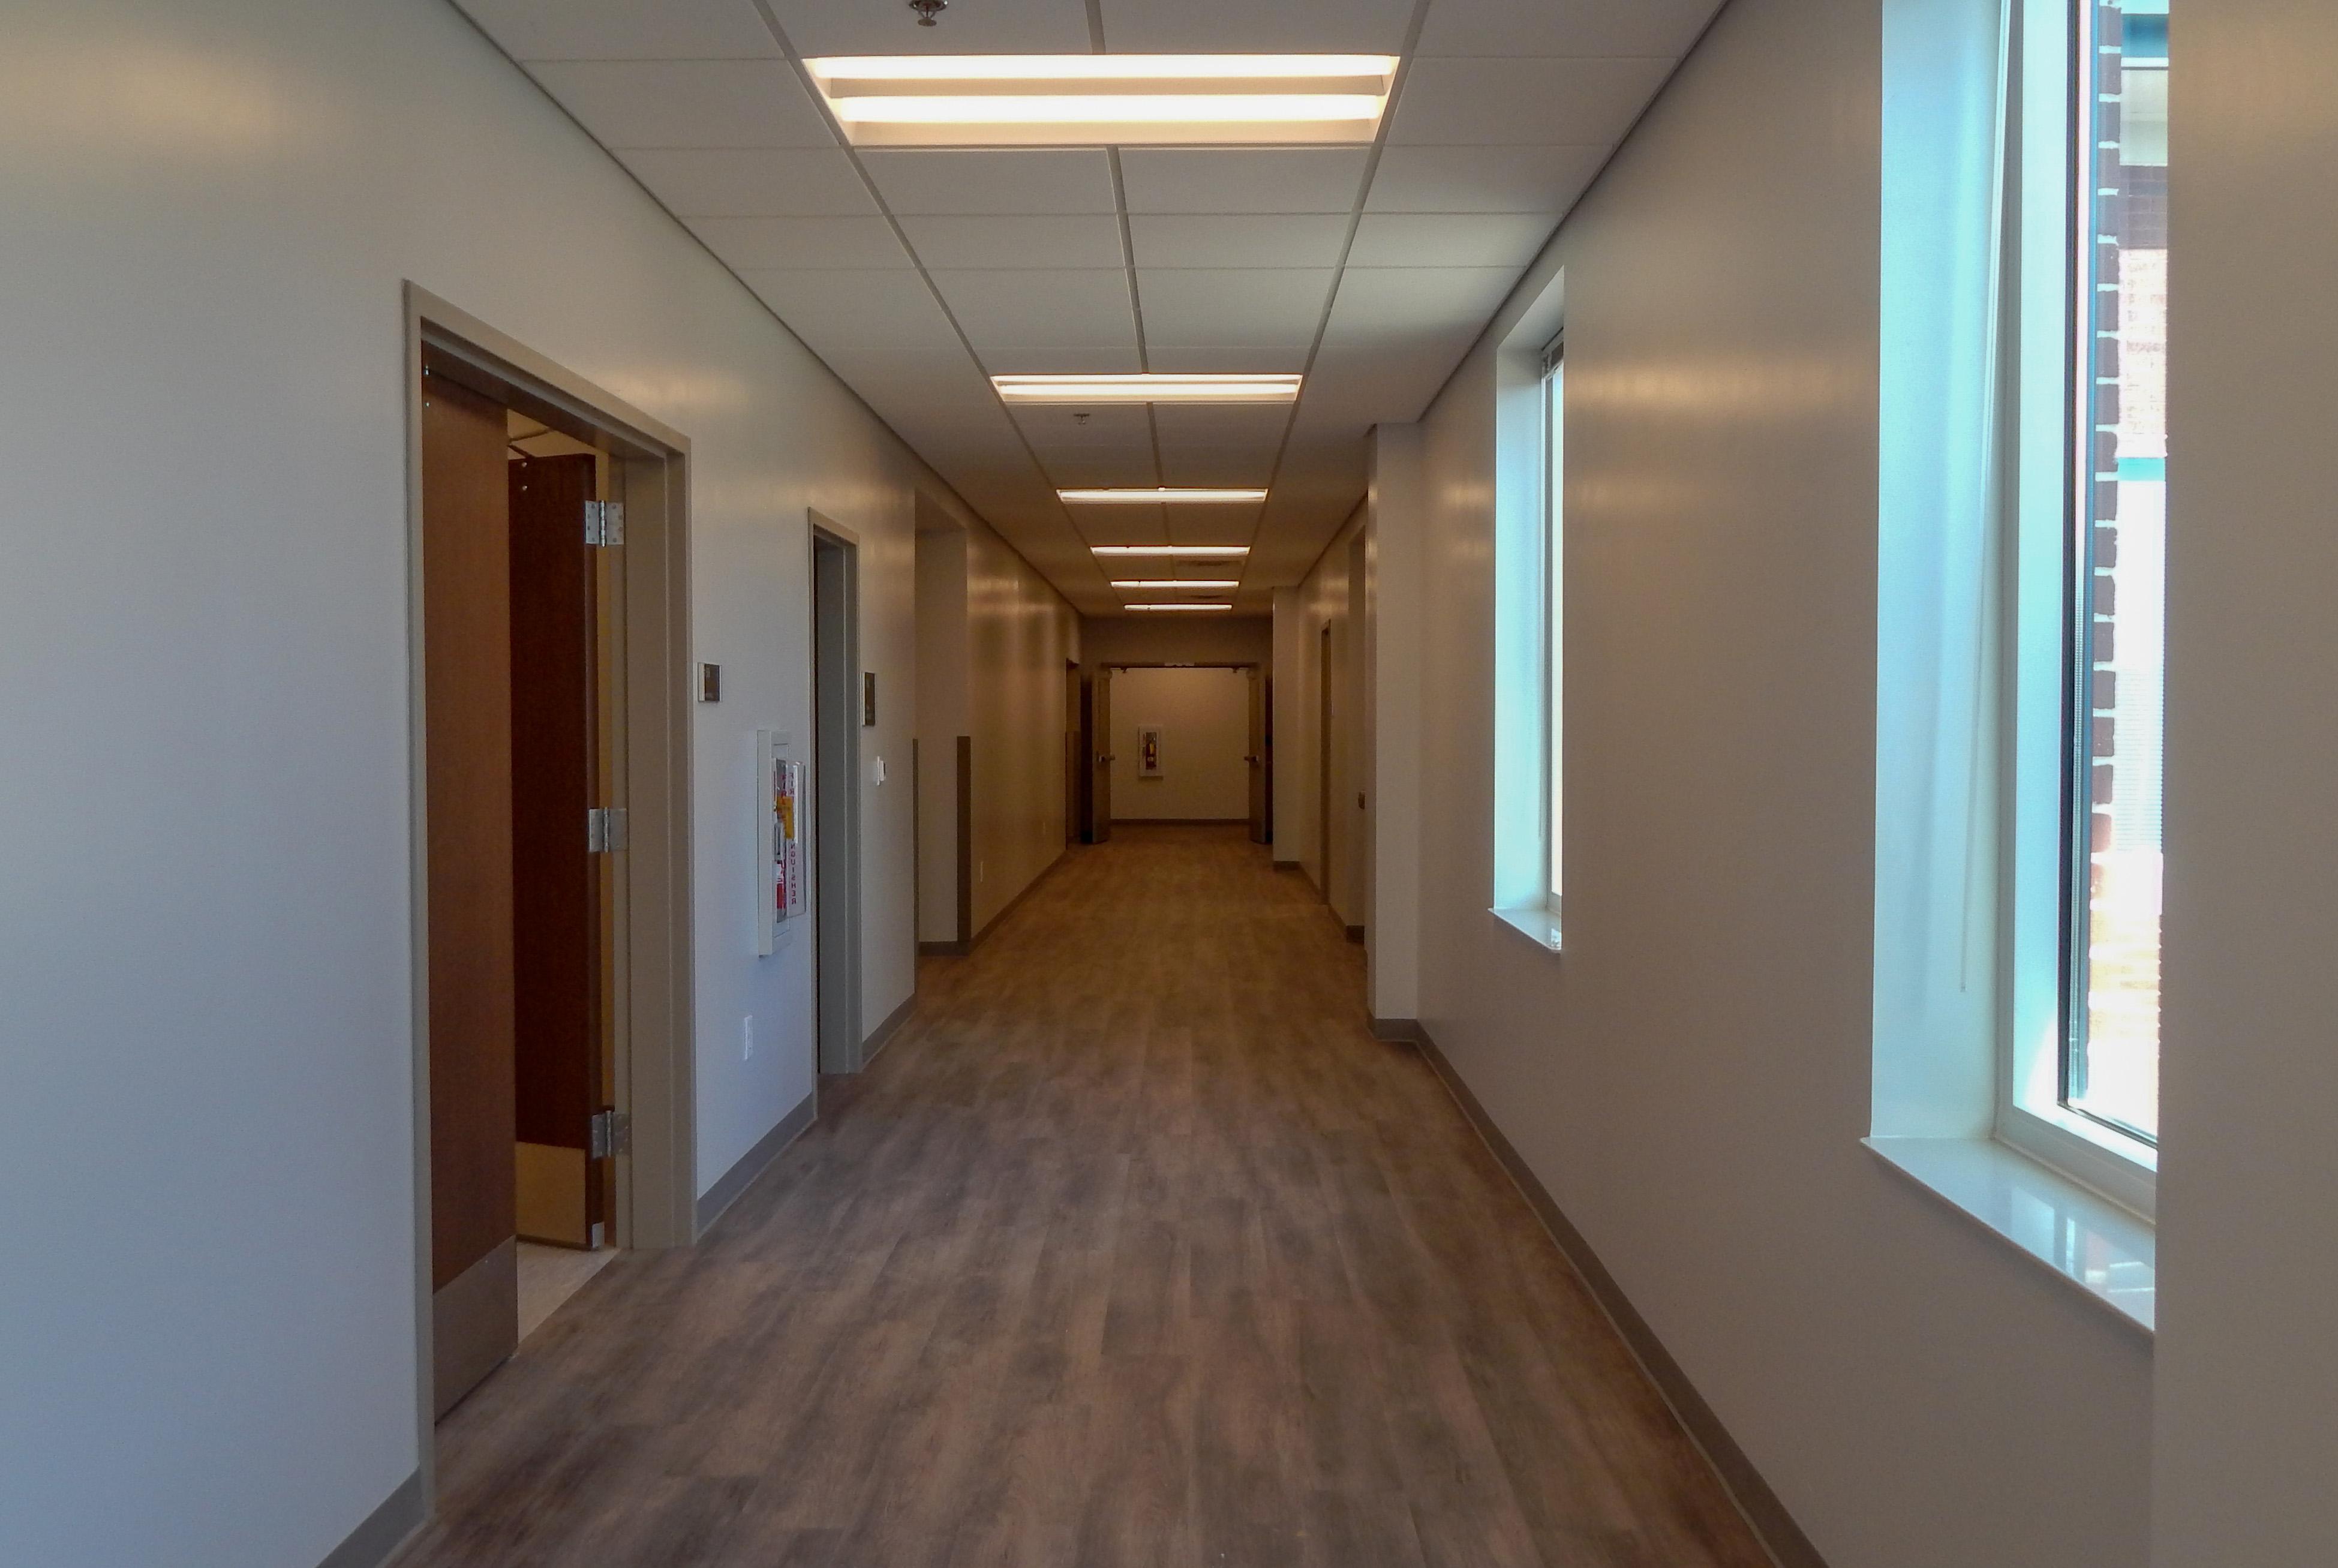 Exterior Hallways for GDOT District 6 Admin | Cooper & Company